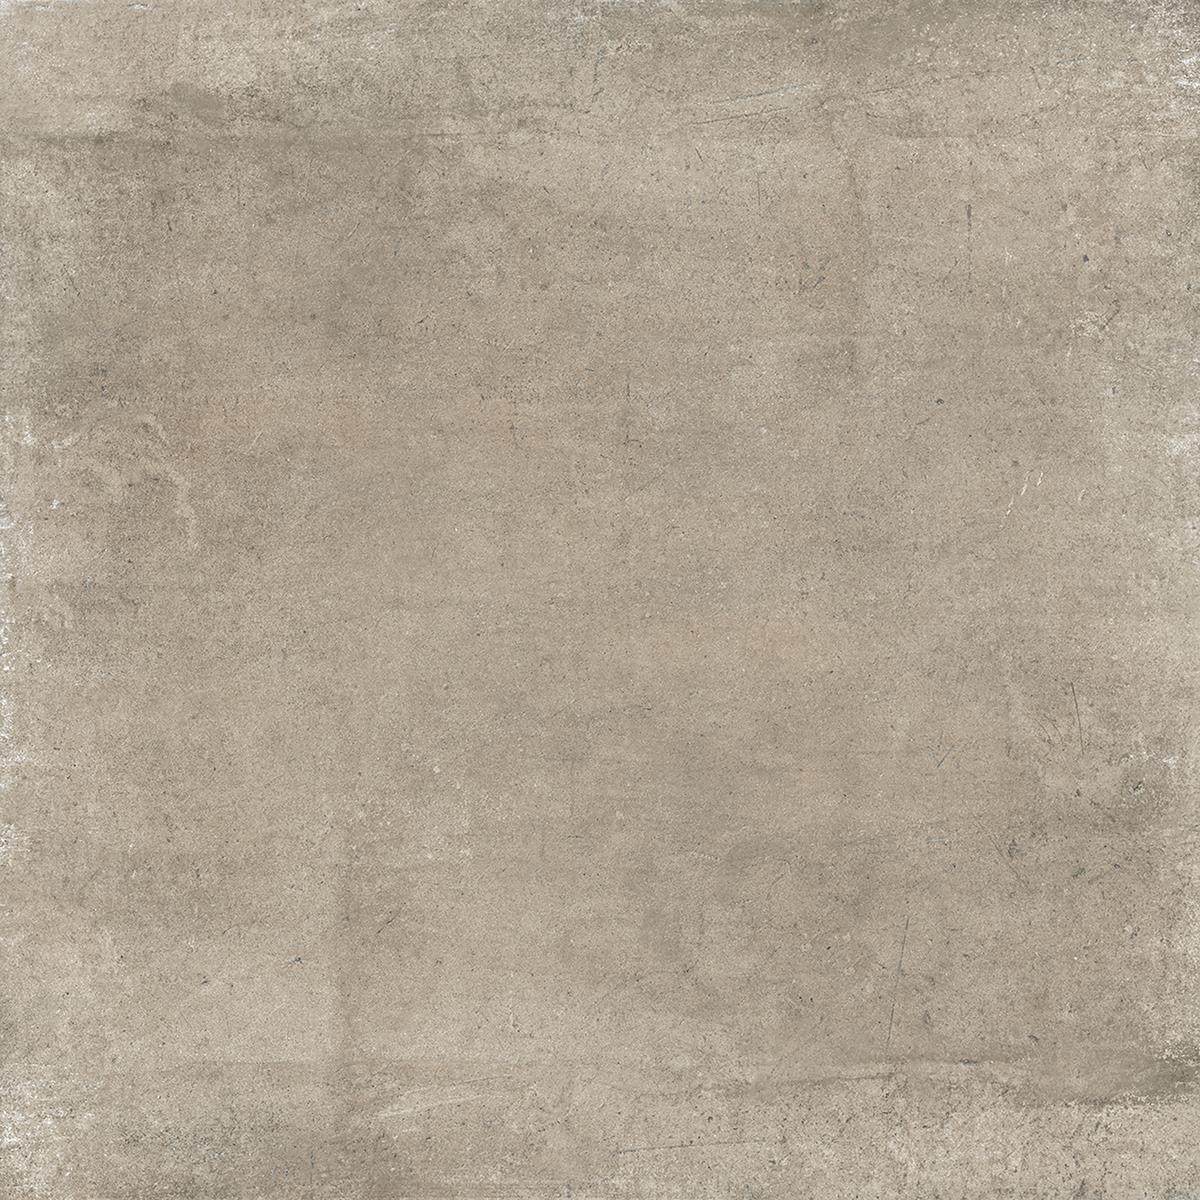 Del Conca London Grigio-20LD05 20x20 MATT Boden-/Wandfliese